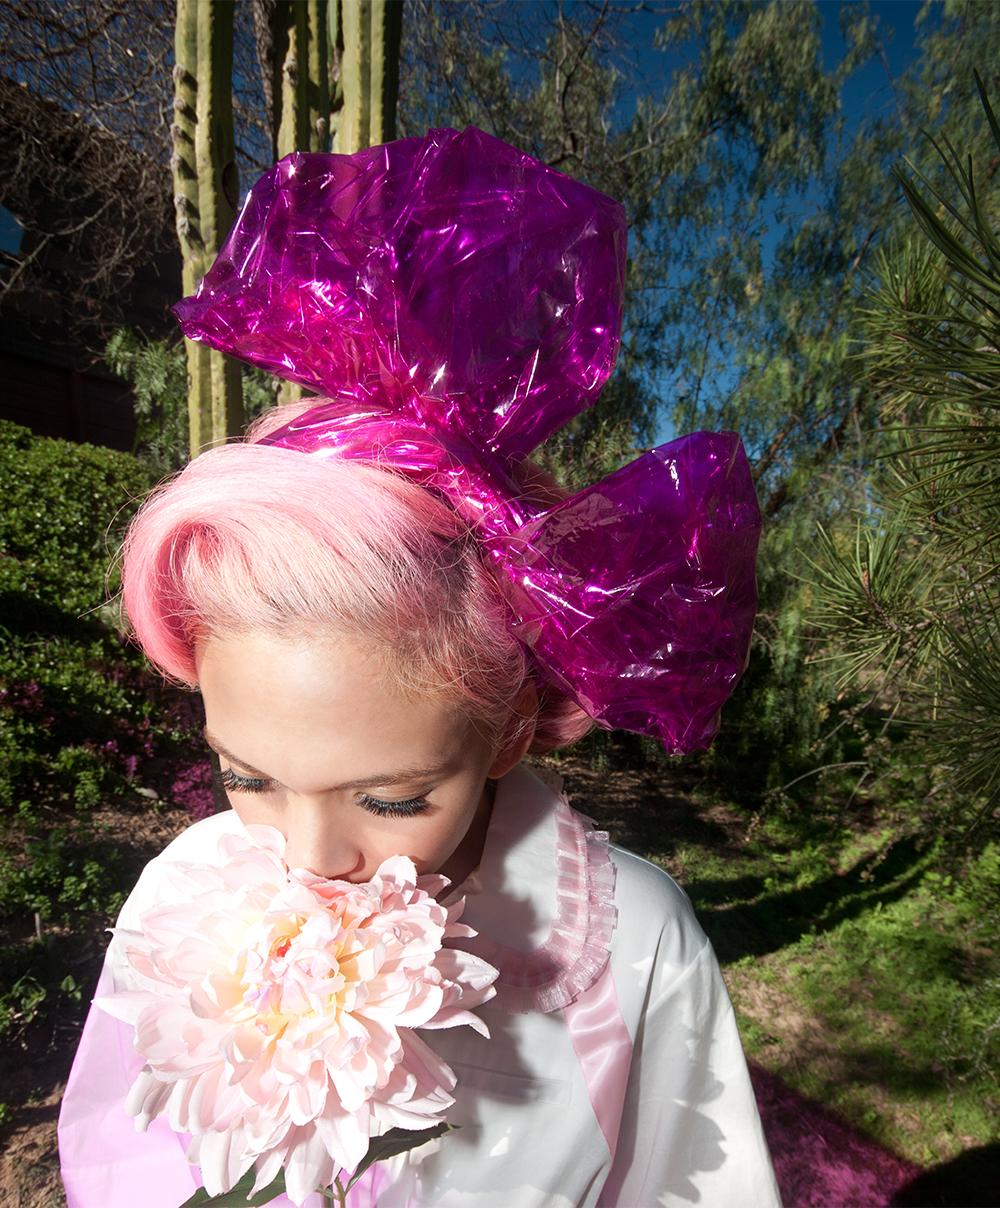 cynthia-mittweg-nicopanda-pink-ruffle-dress-pink-bow